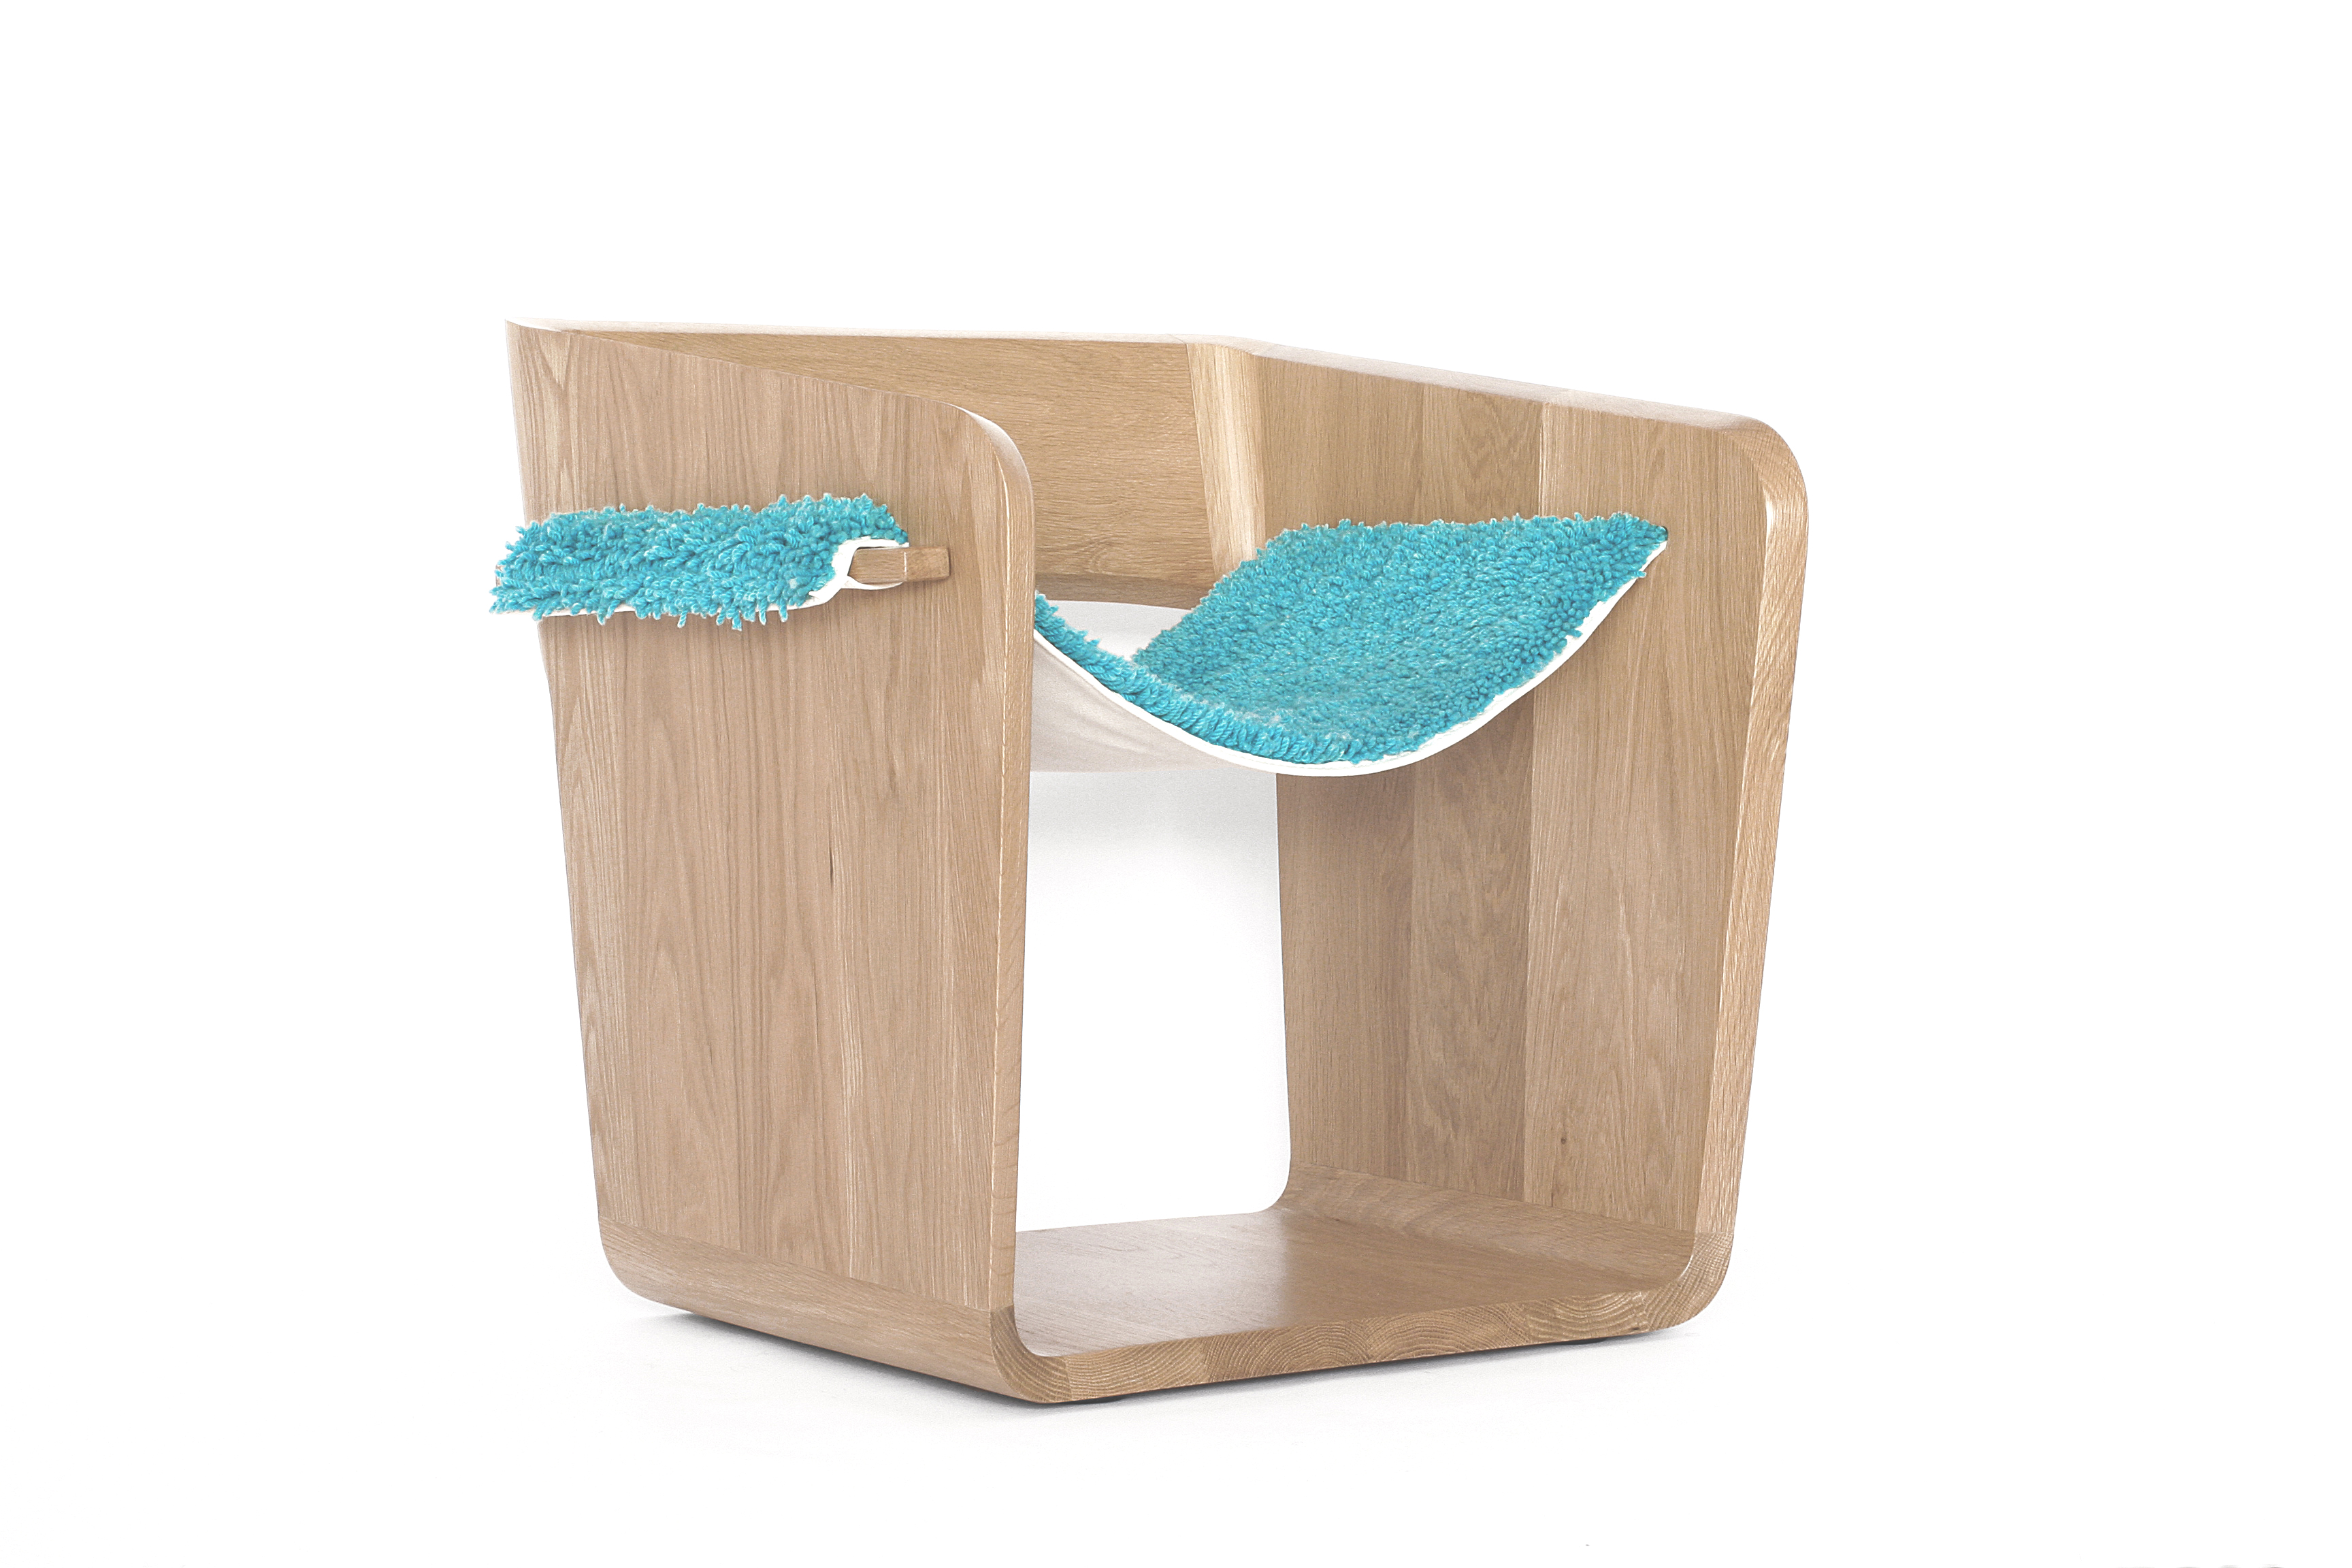 DAM. Dressed chair